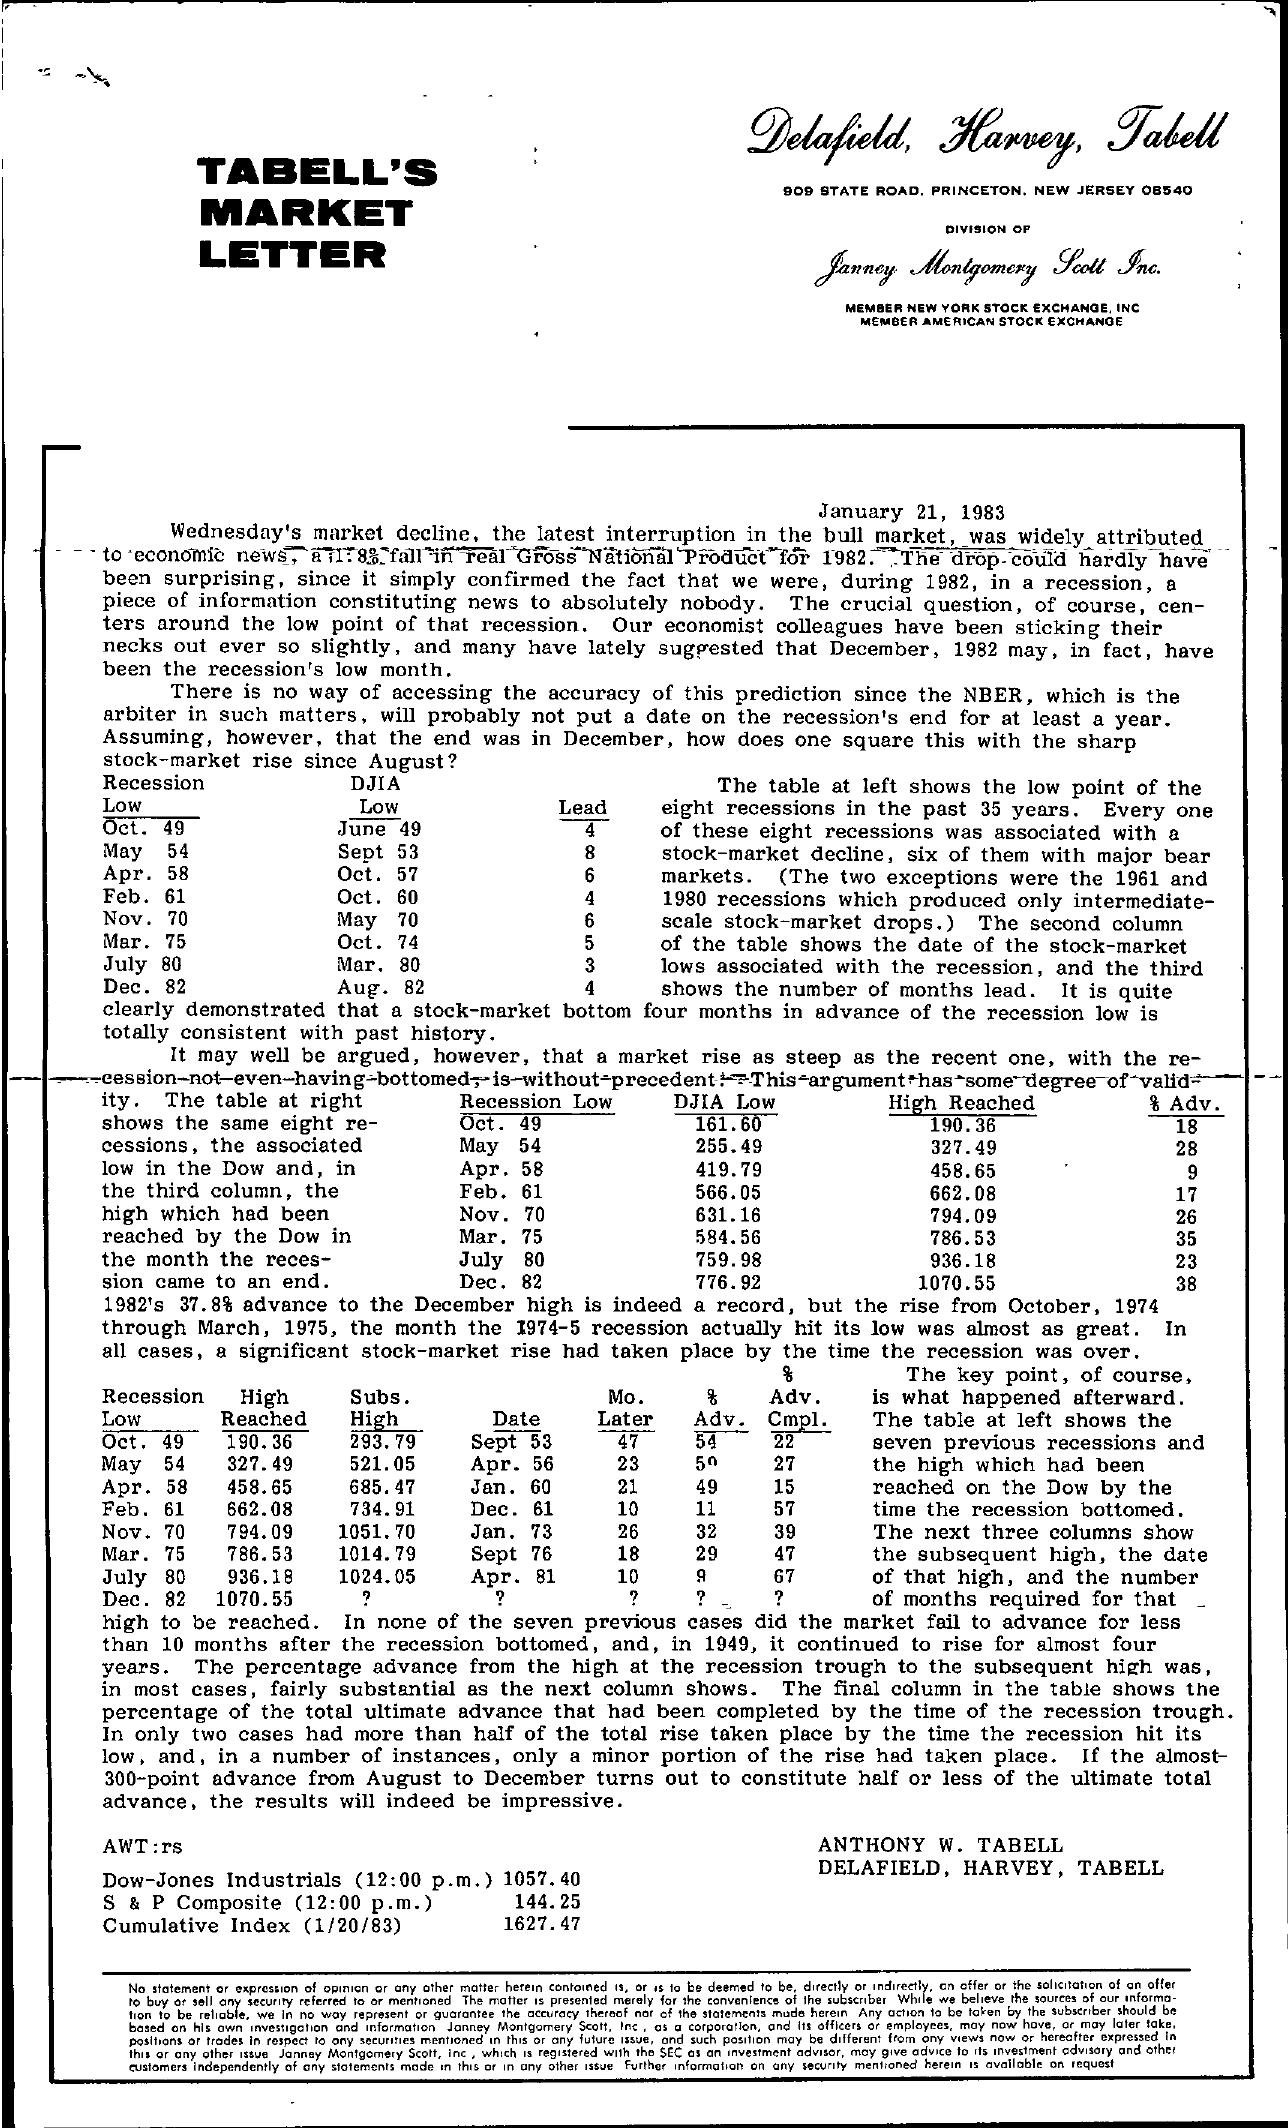 Tabell's Market Letter - January 21, 1983